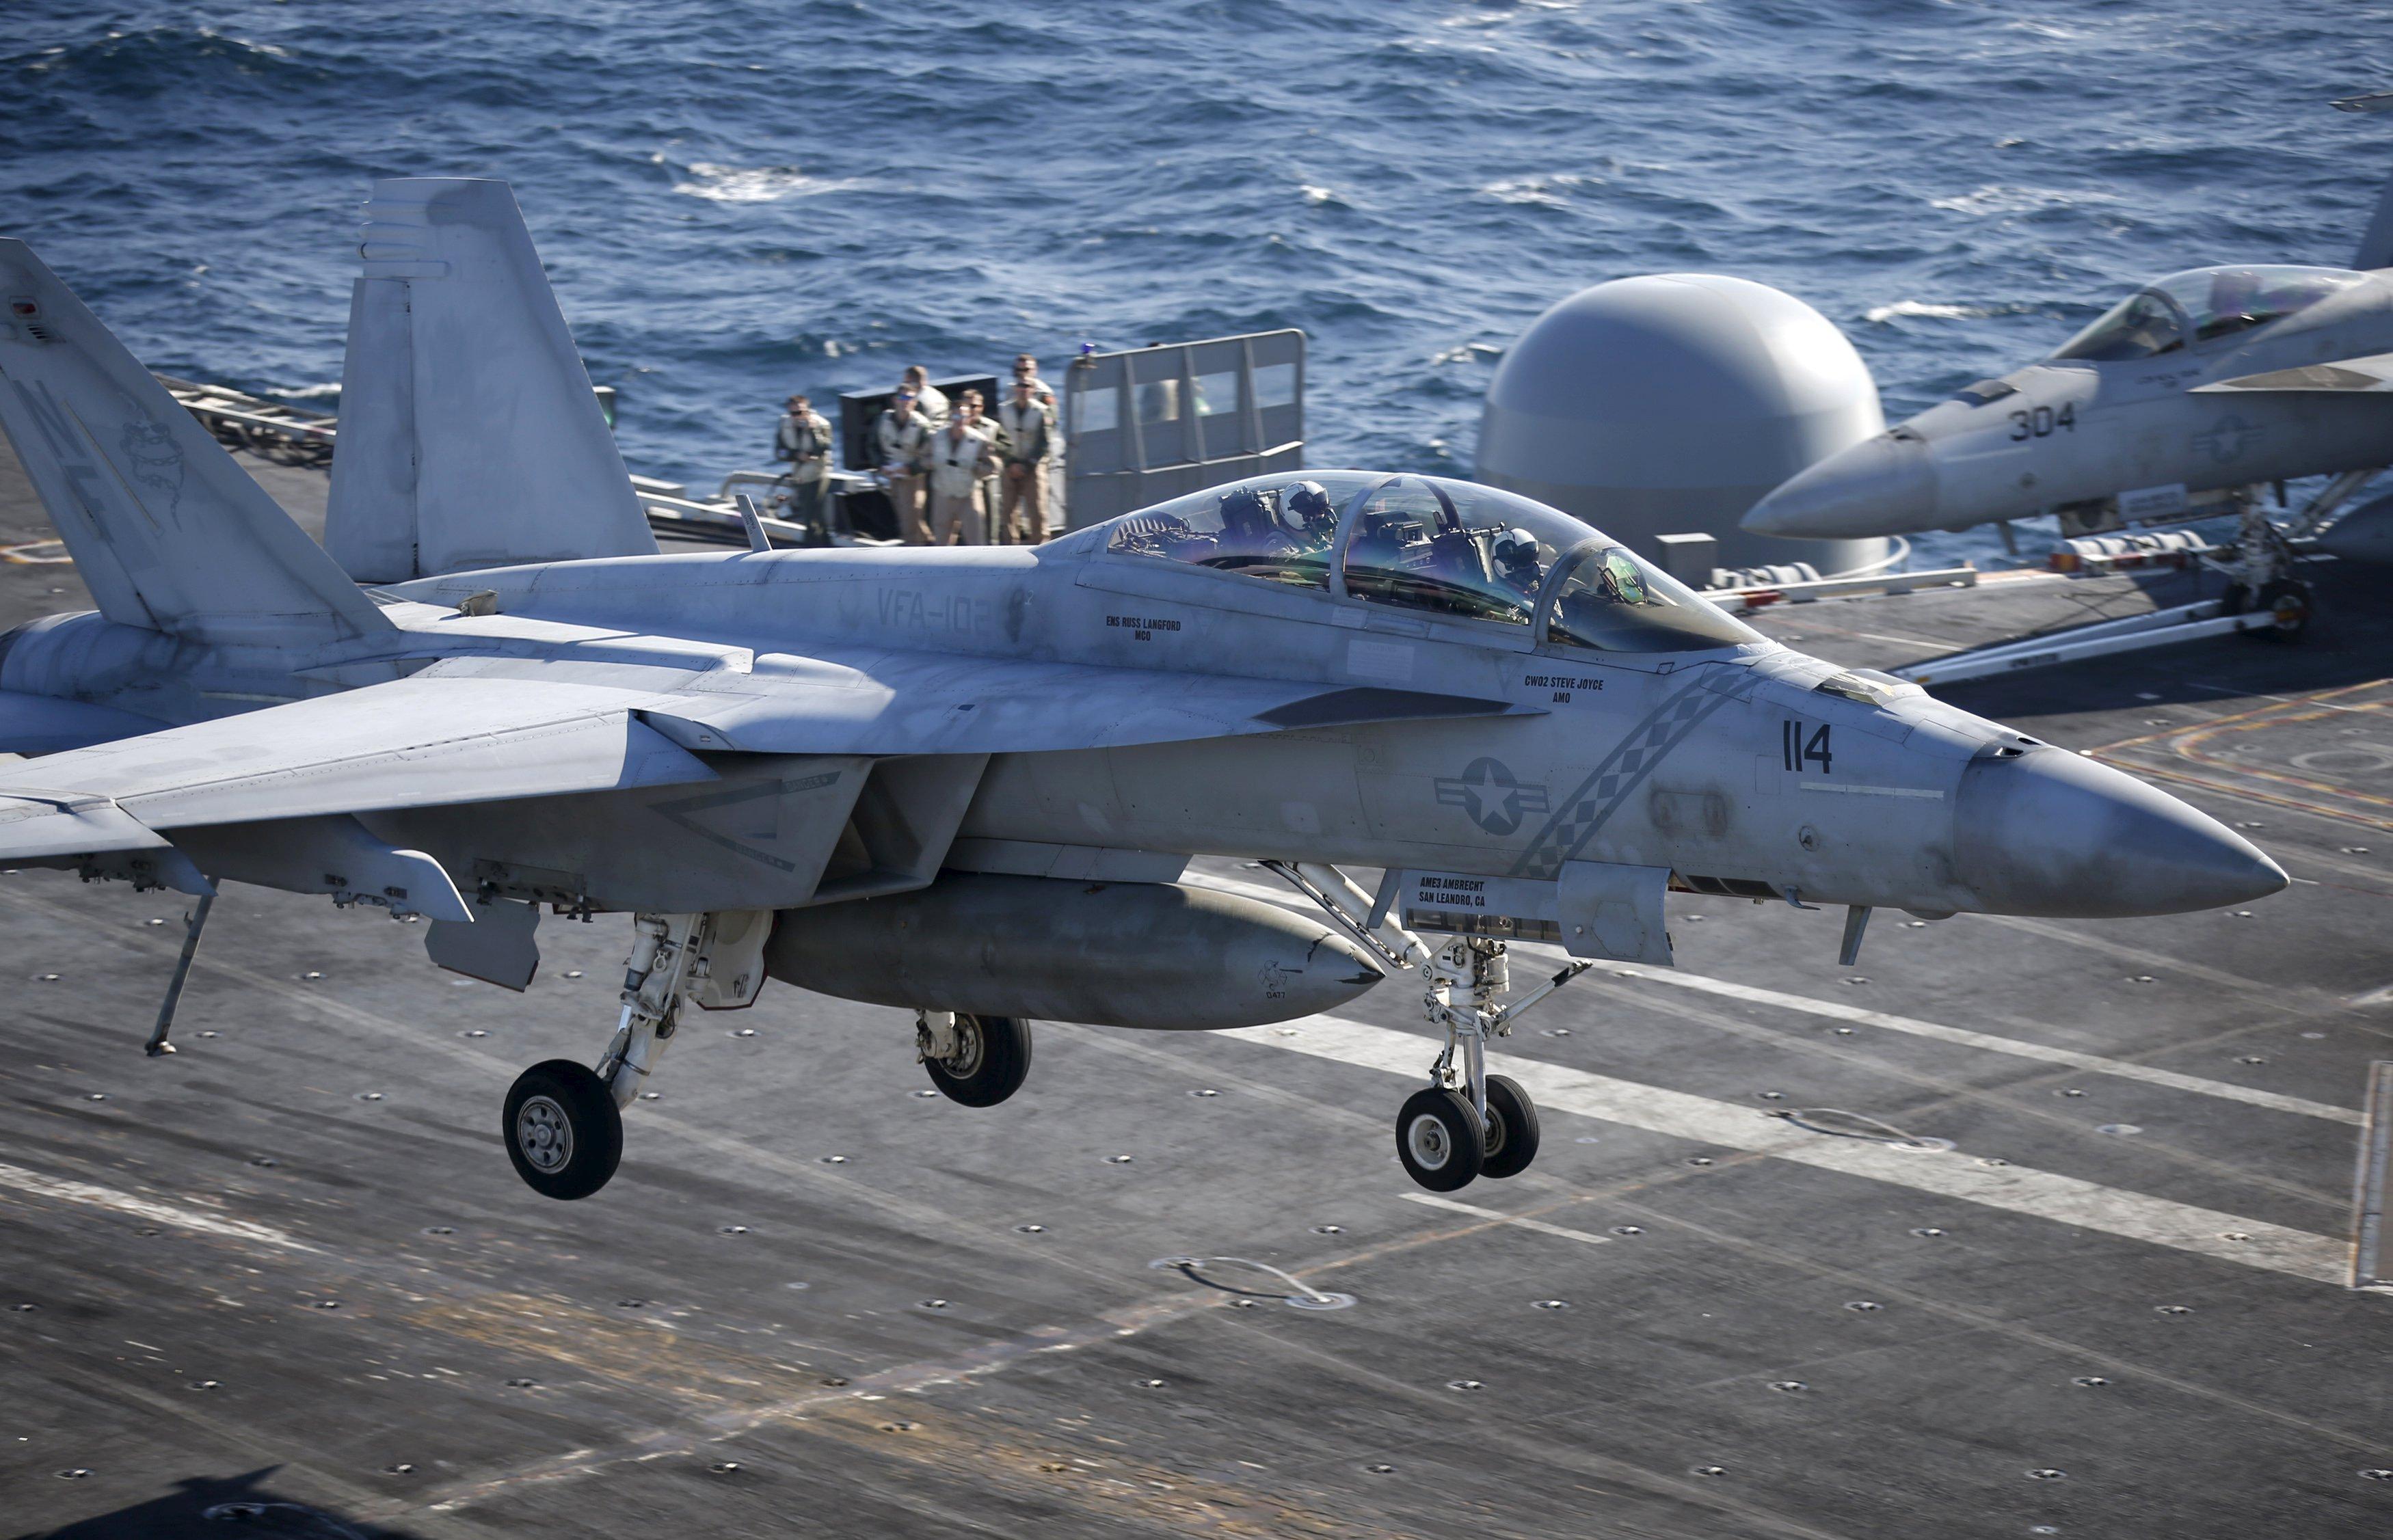 El cazabombarderos F / A-18 Hornet aterriza en el portaviones USS Ronald Reagan